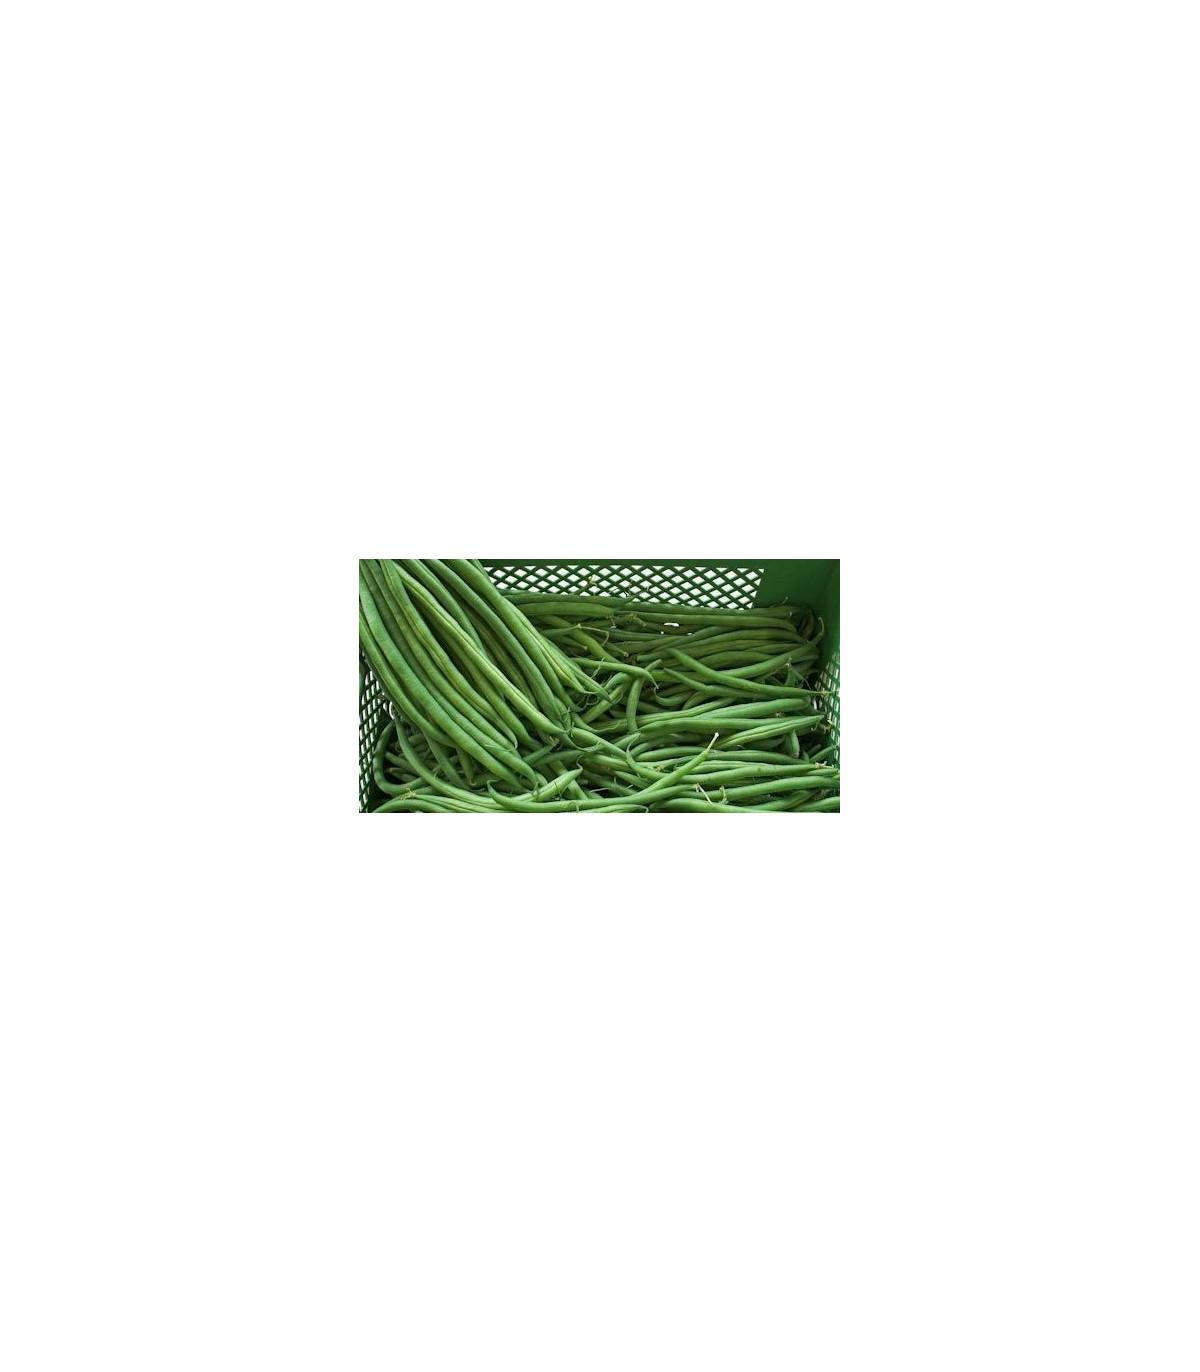 Fazol keříčkový Newton - prodej semen fazole - 8 ks